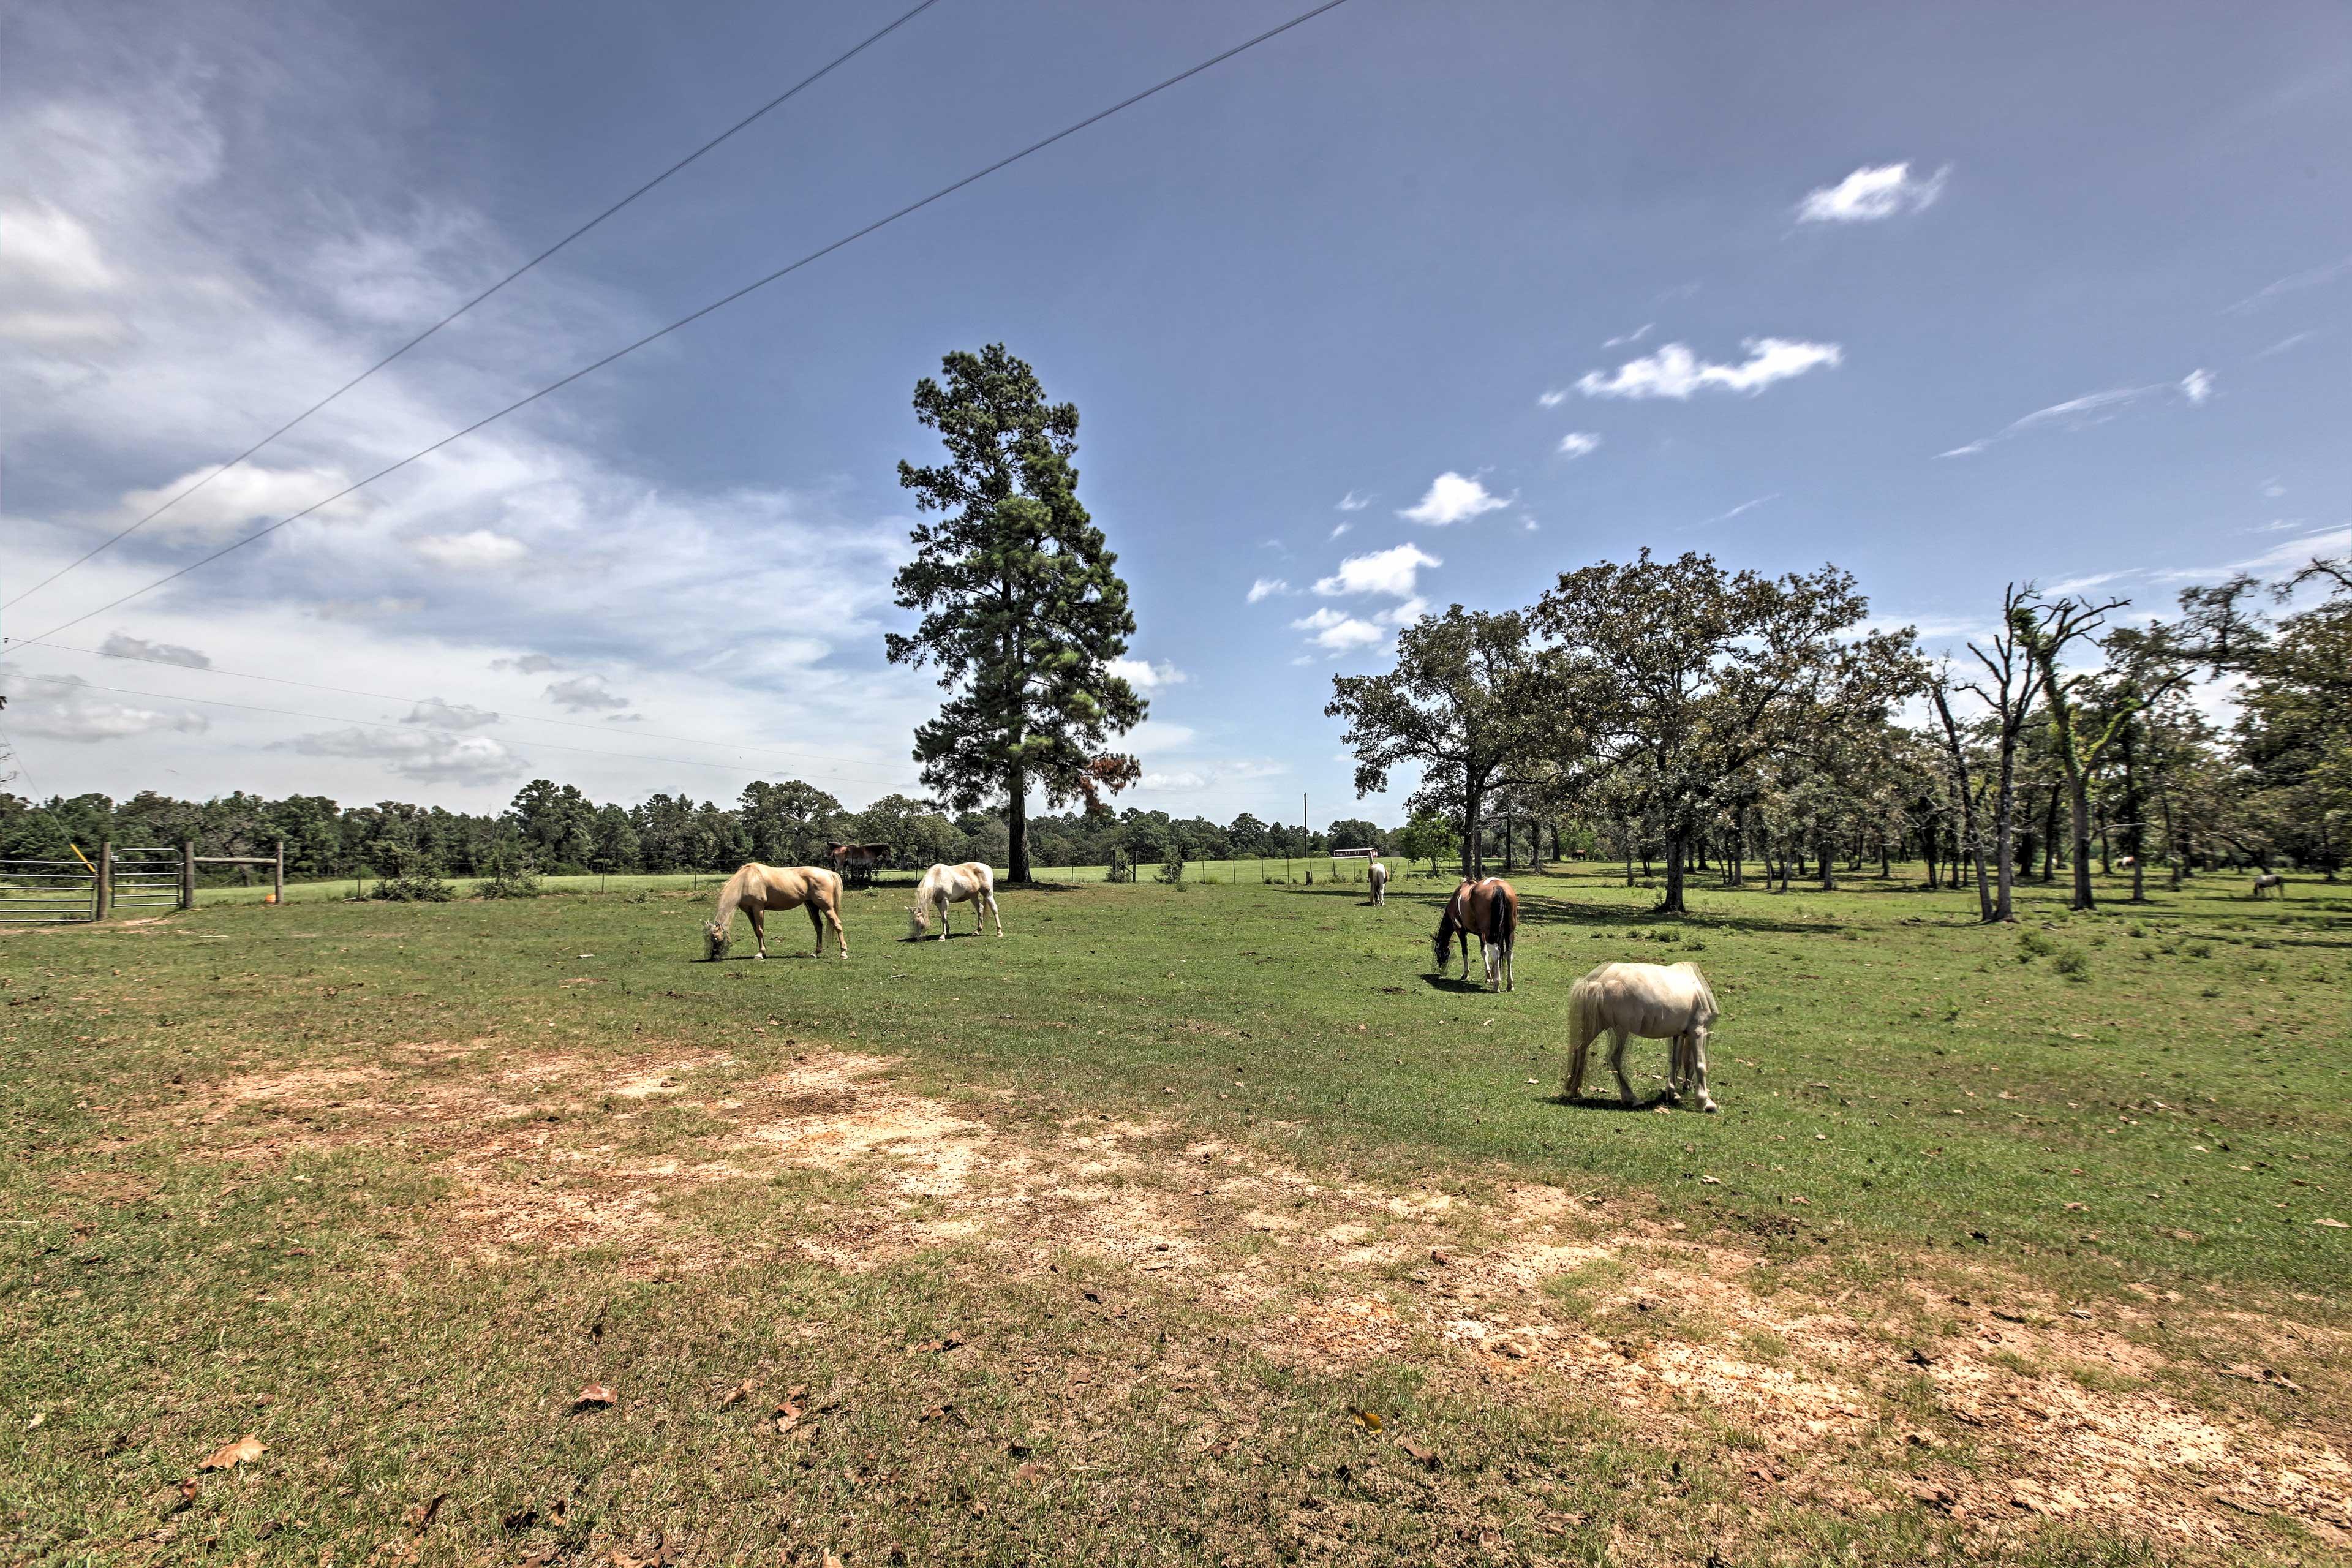 Admire all the farm animals grazing around this Texas cabin.